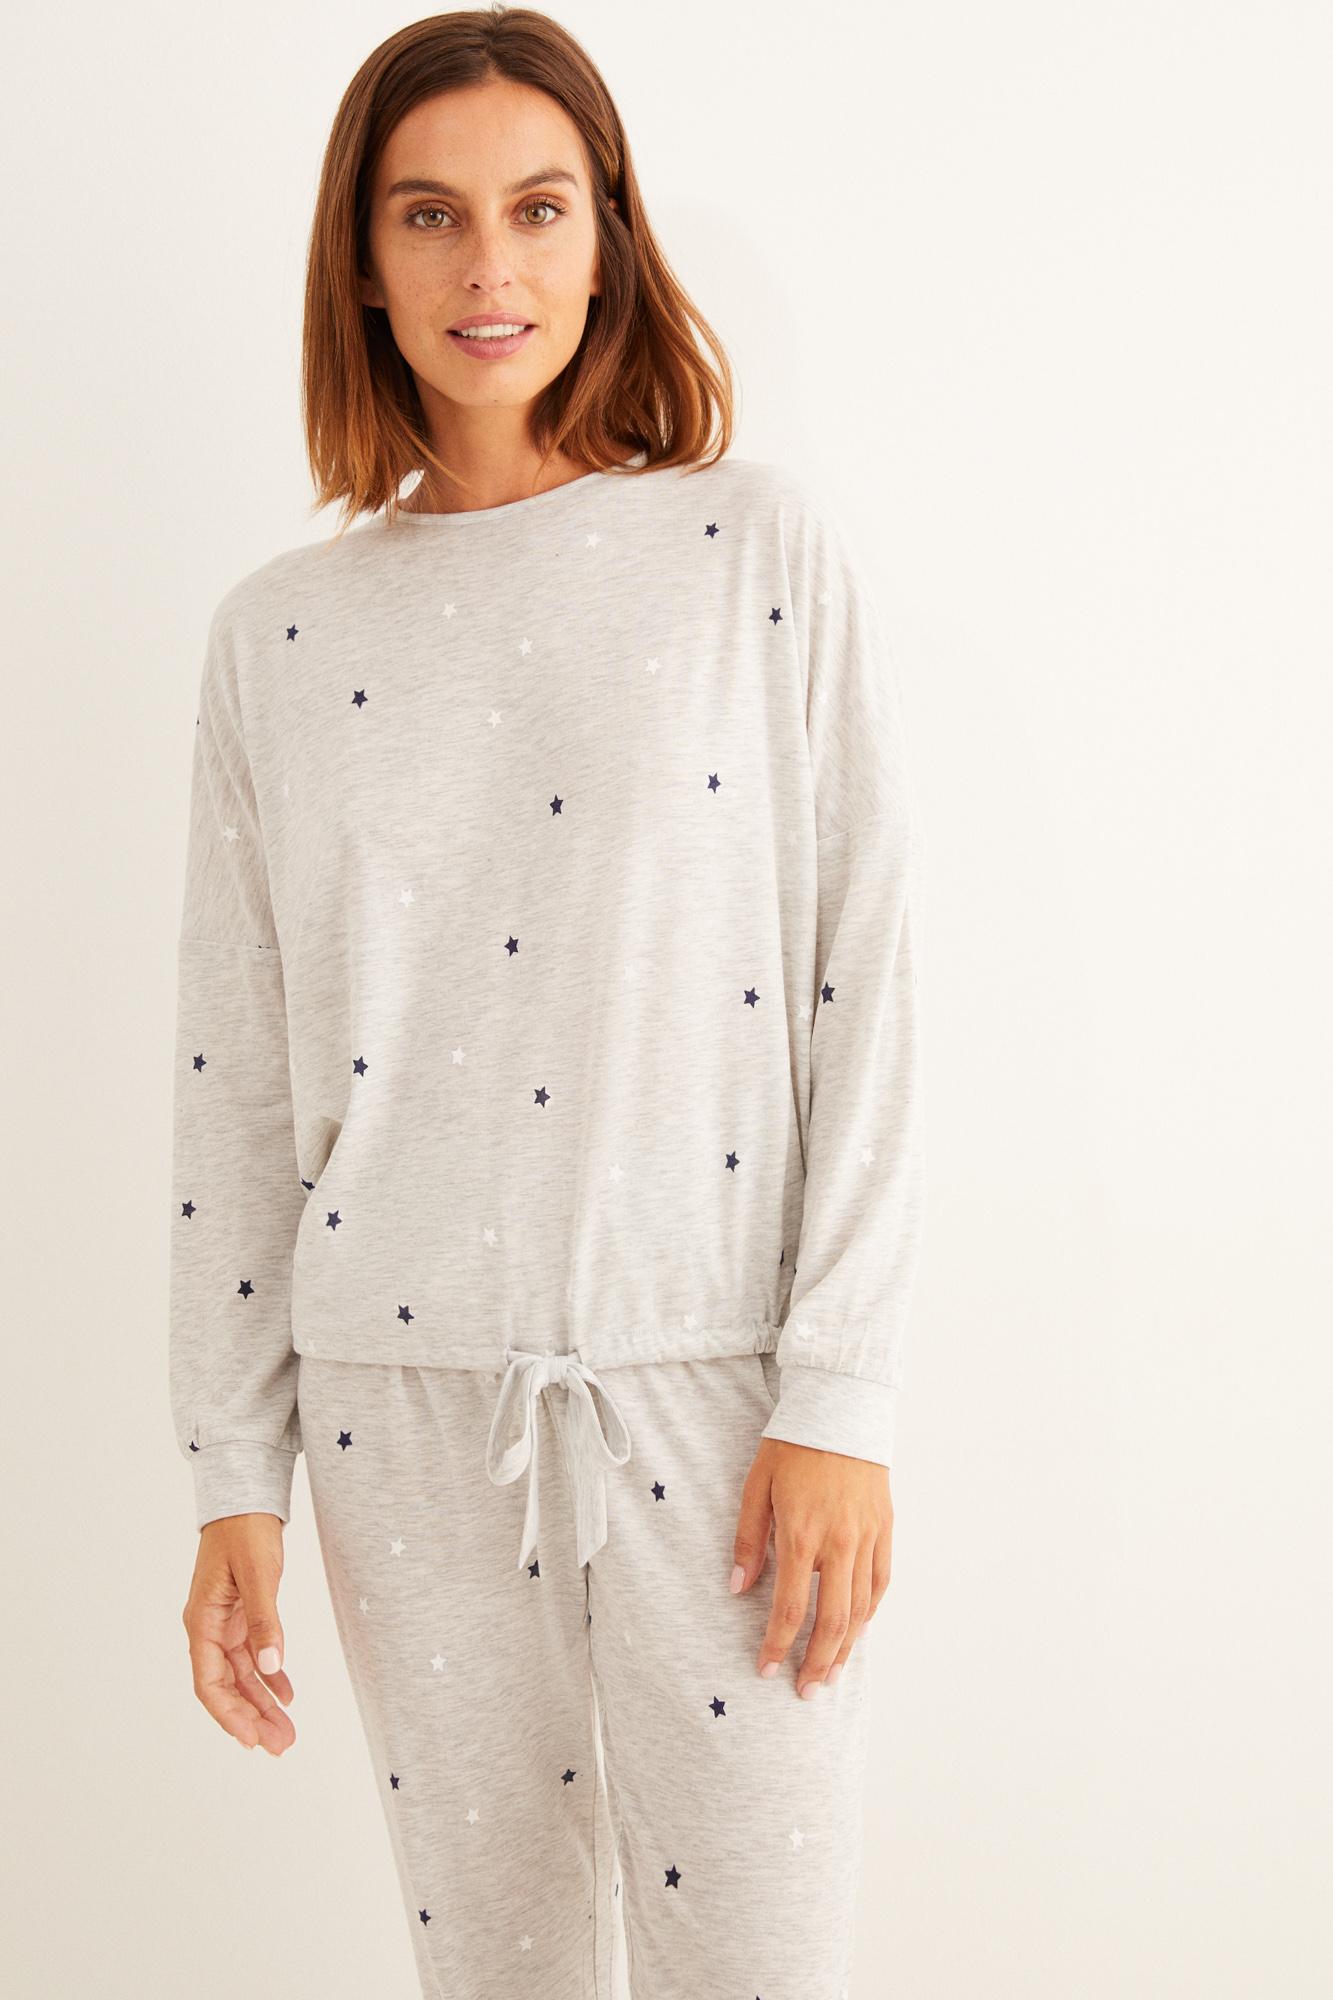 Pijama largo invierno estrellas gris